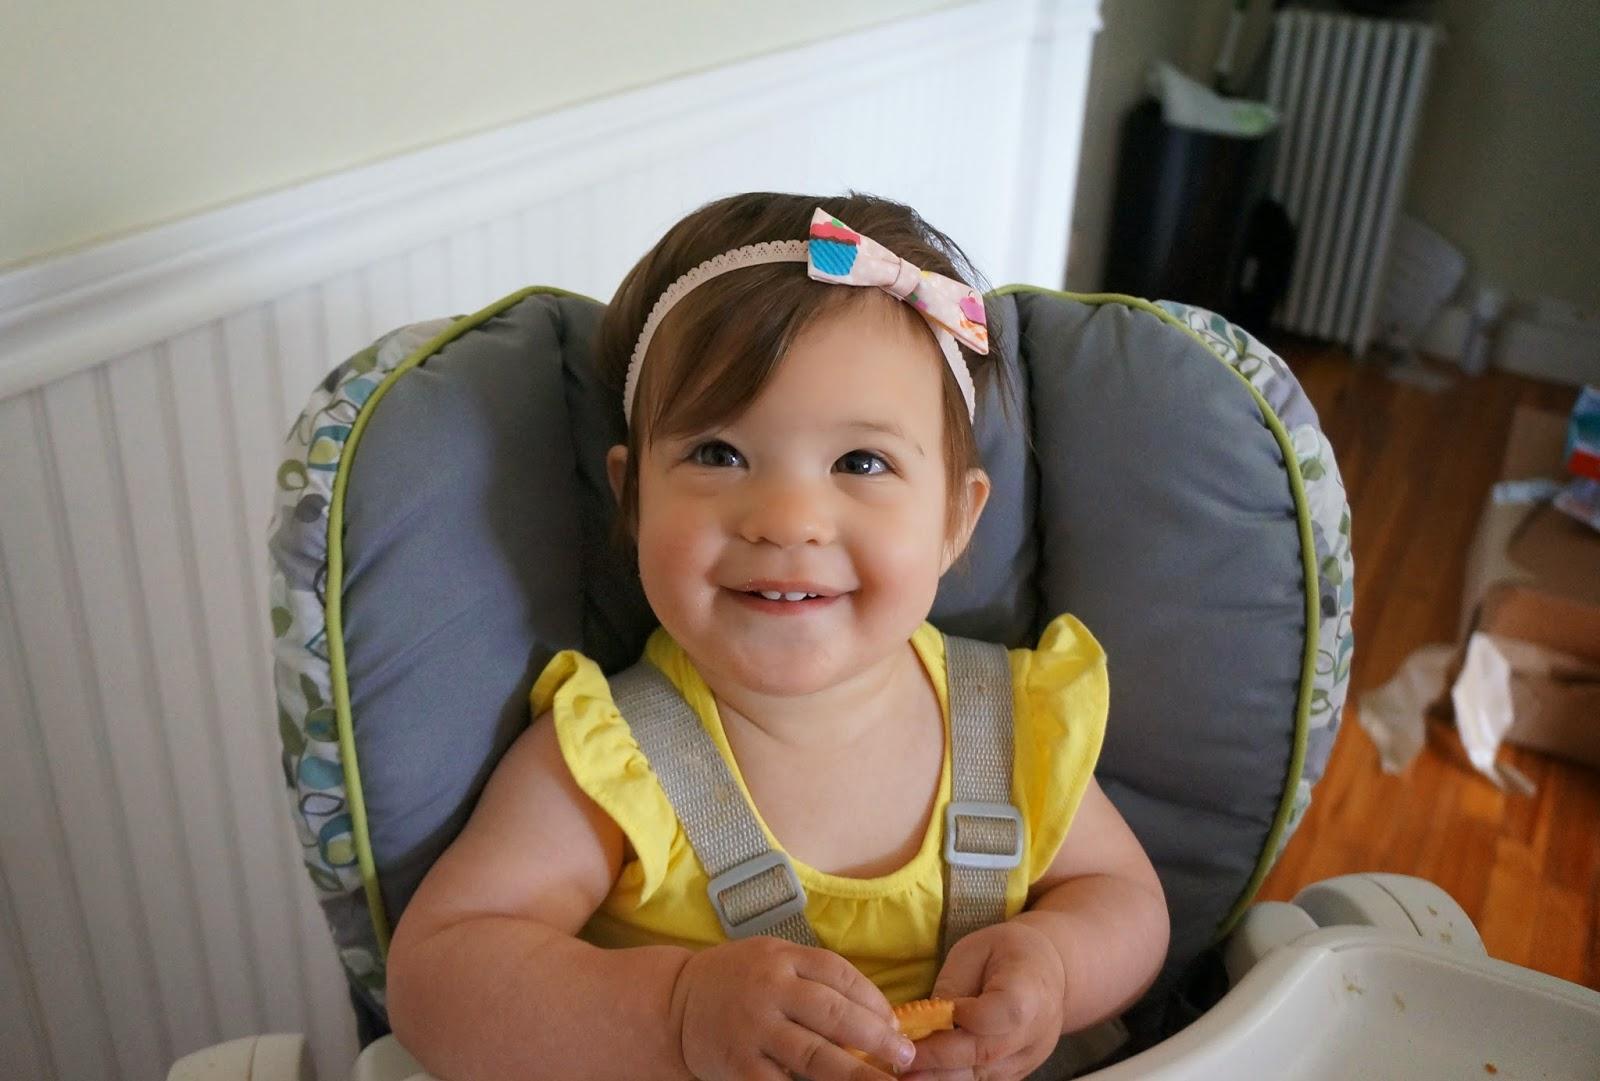 DIY No Sew Baby Bow Headband hellokelcey.blogspot.com